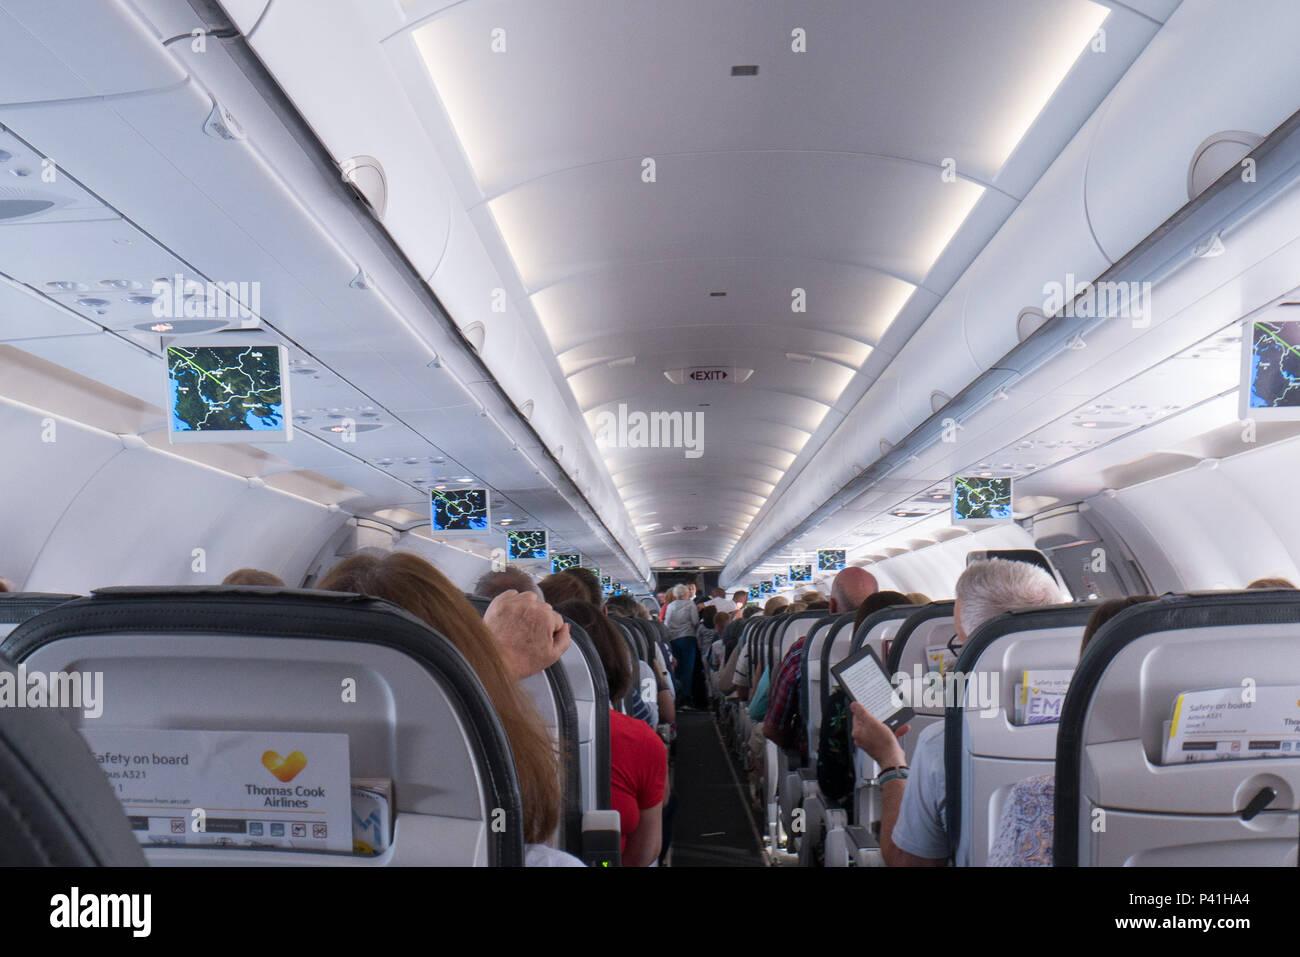 Airbus A321 Interior Stock Photo 209018604 Alamy